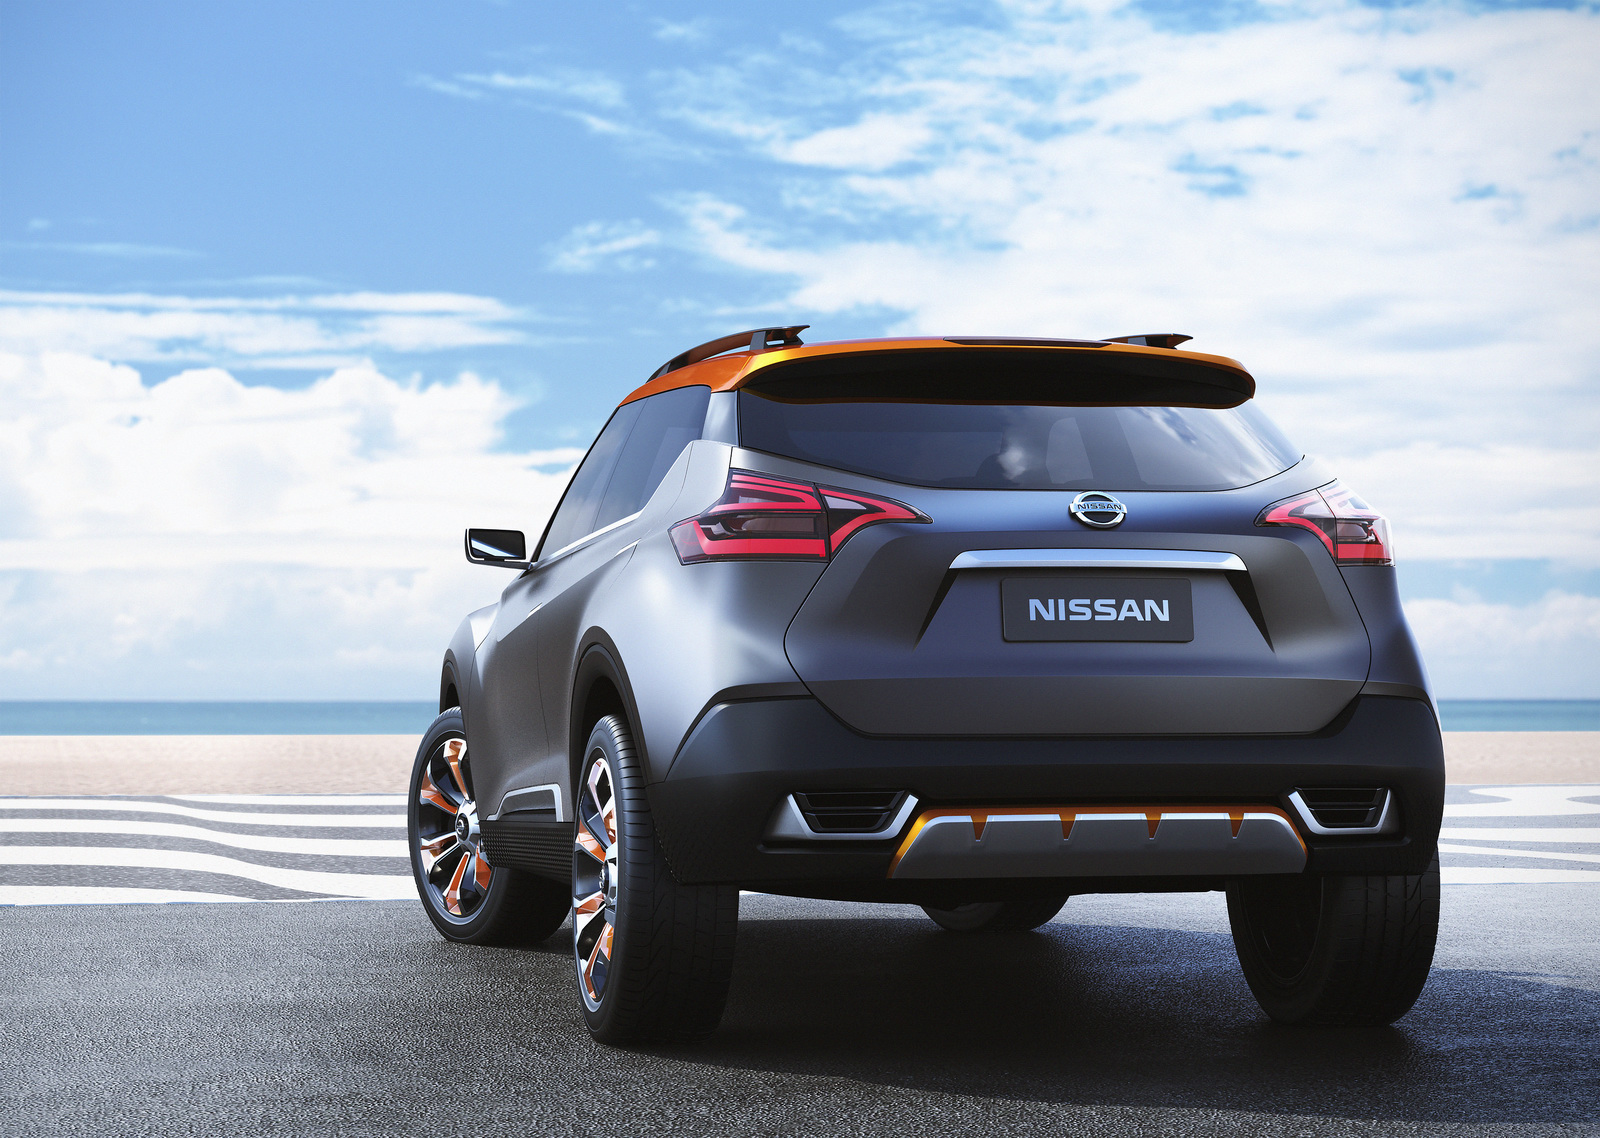 Nissan Kicks Concept Revealed in Brazil, Looks Like ...